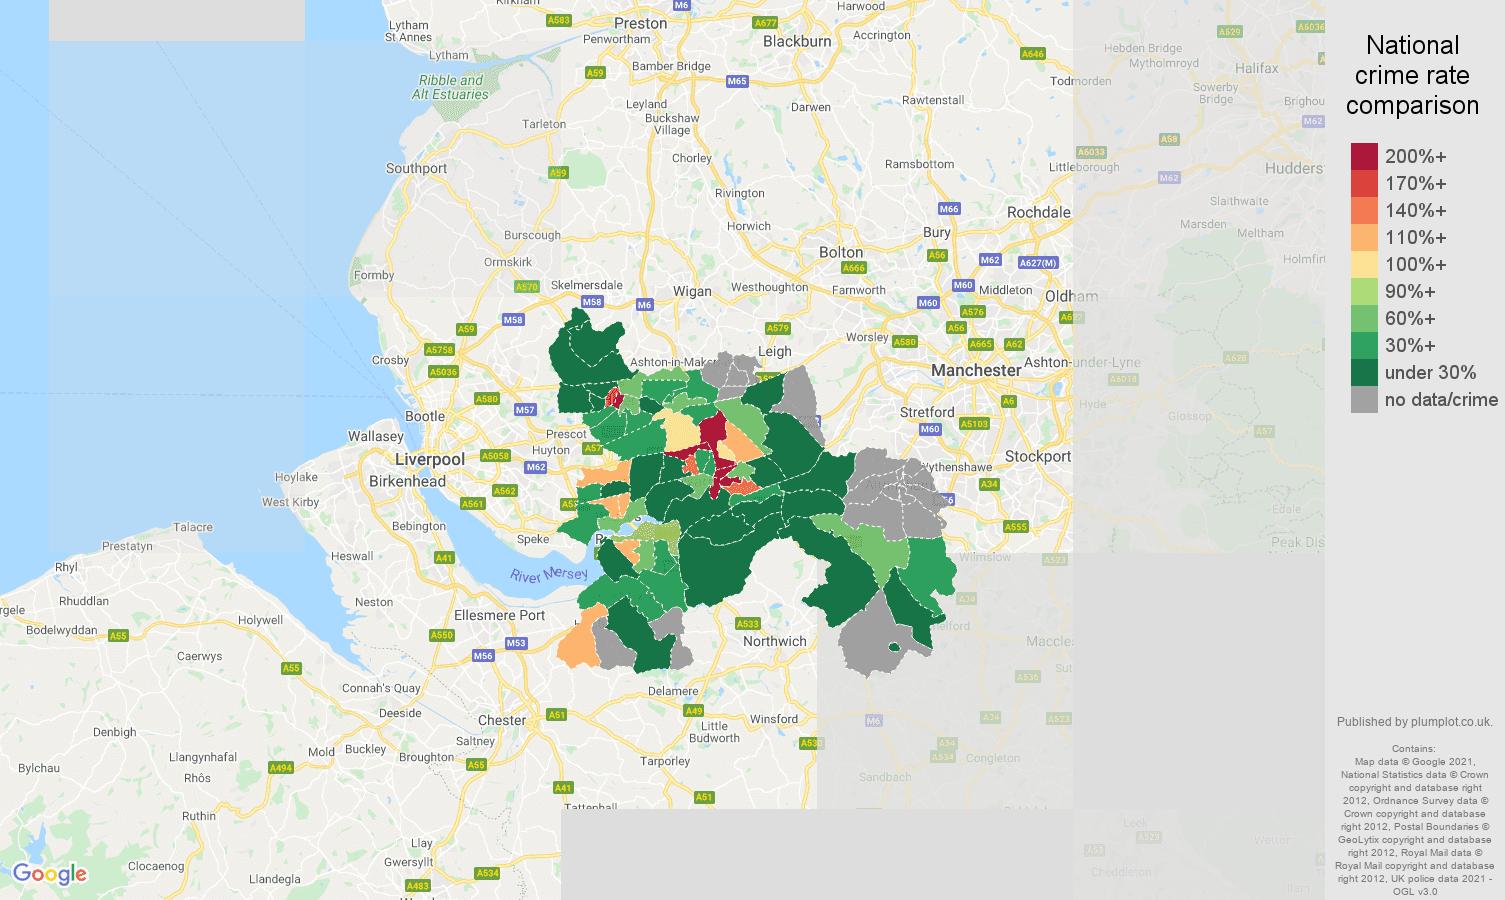 Warrington bicycle theft crime rate comparison map